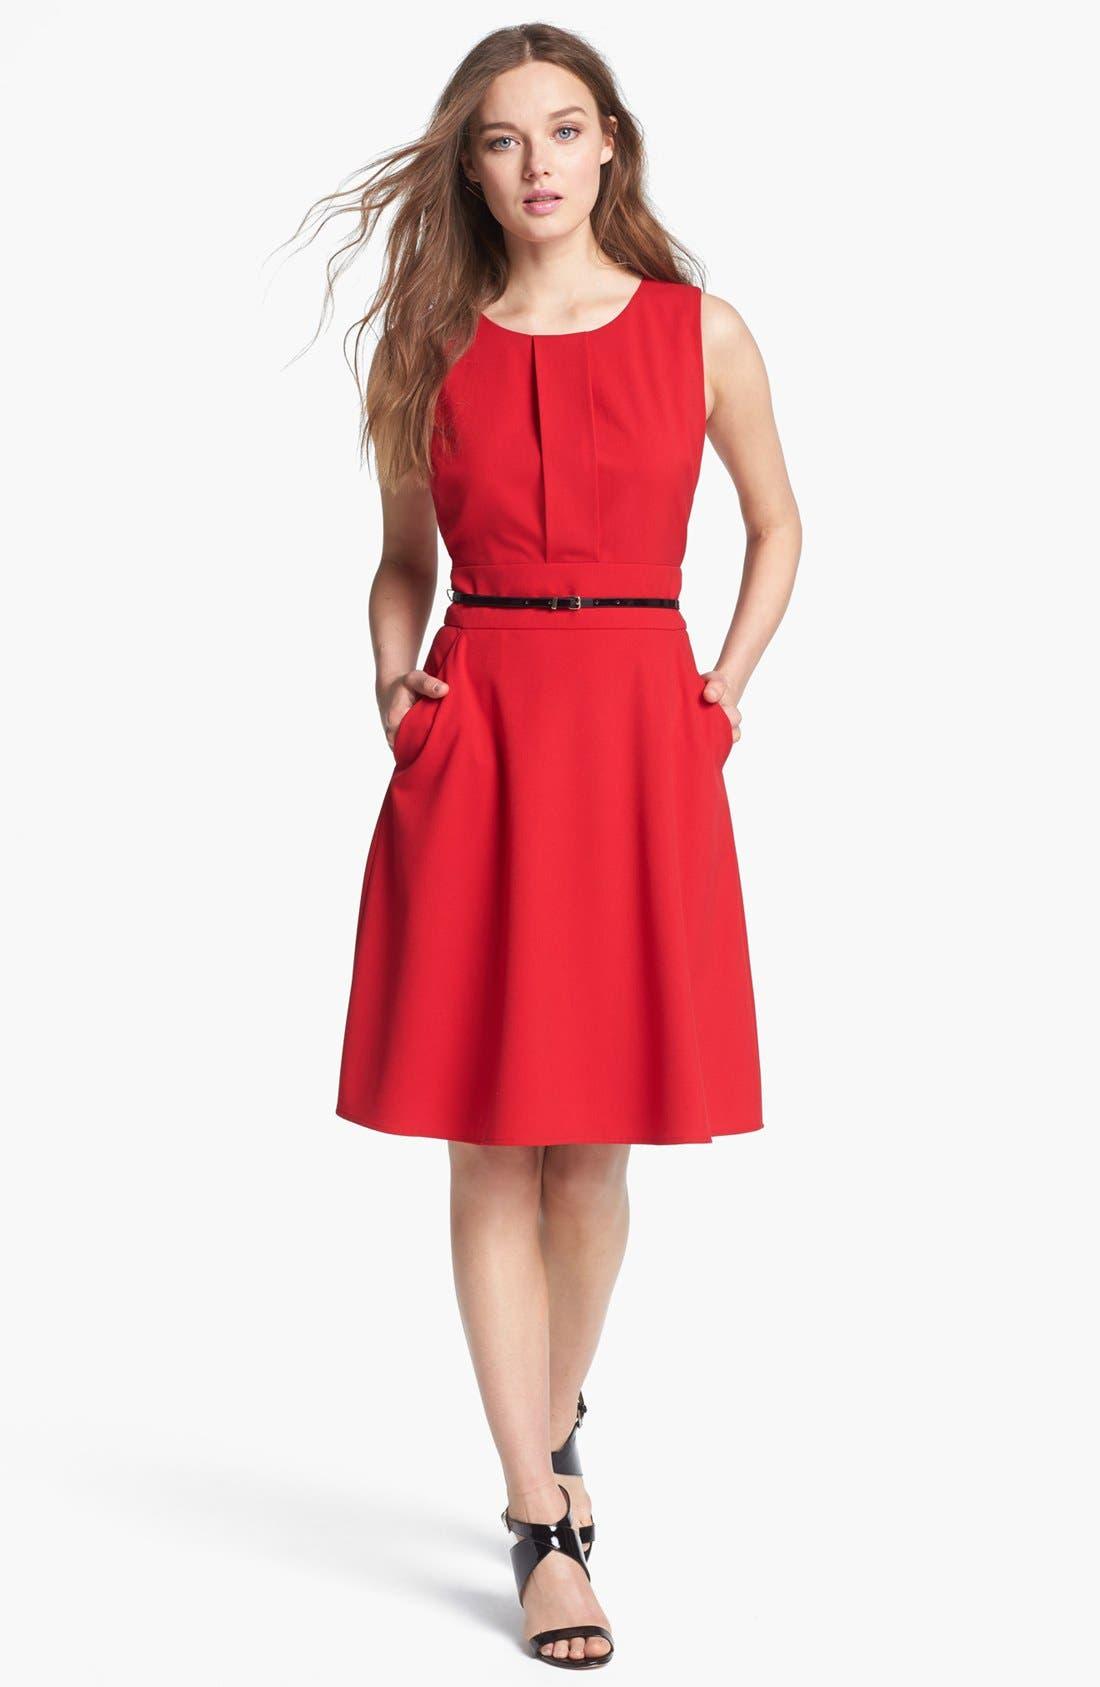 Alternate Image 1 Selected - Calvin Klein Fit & Flare Dress